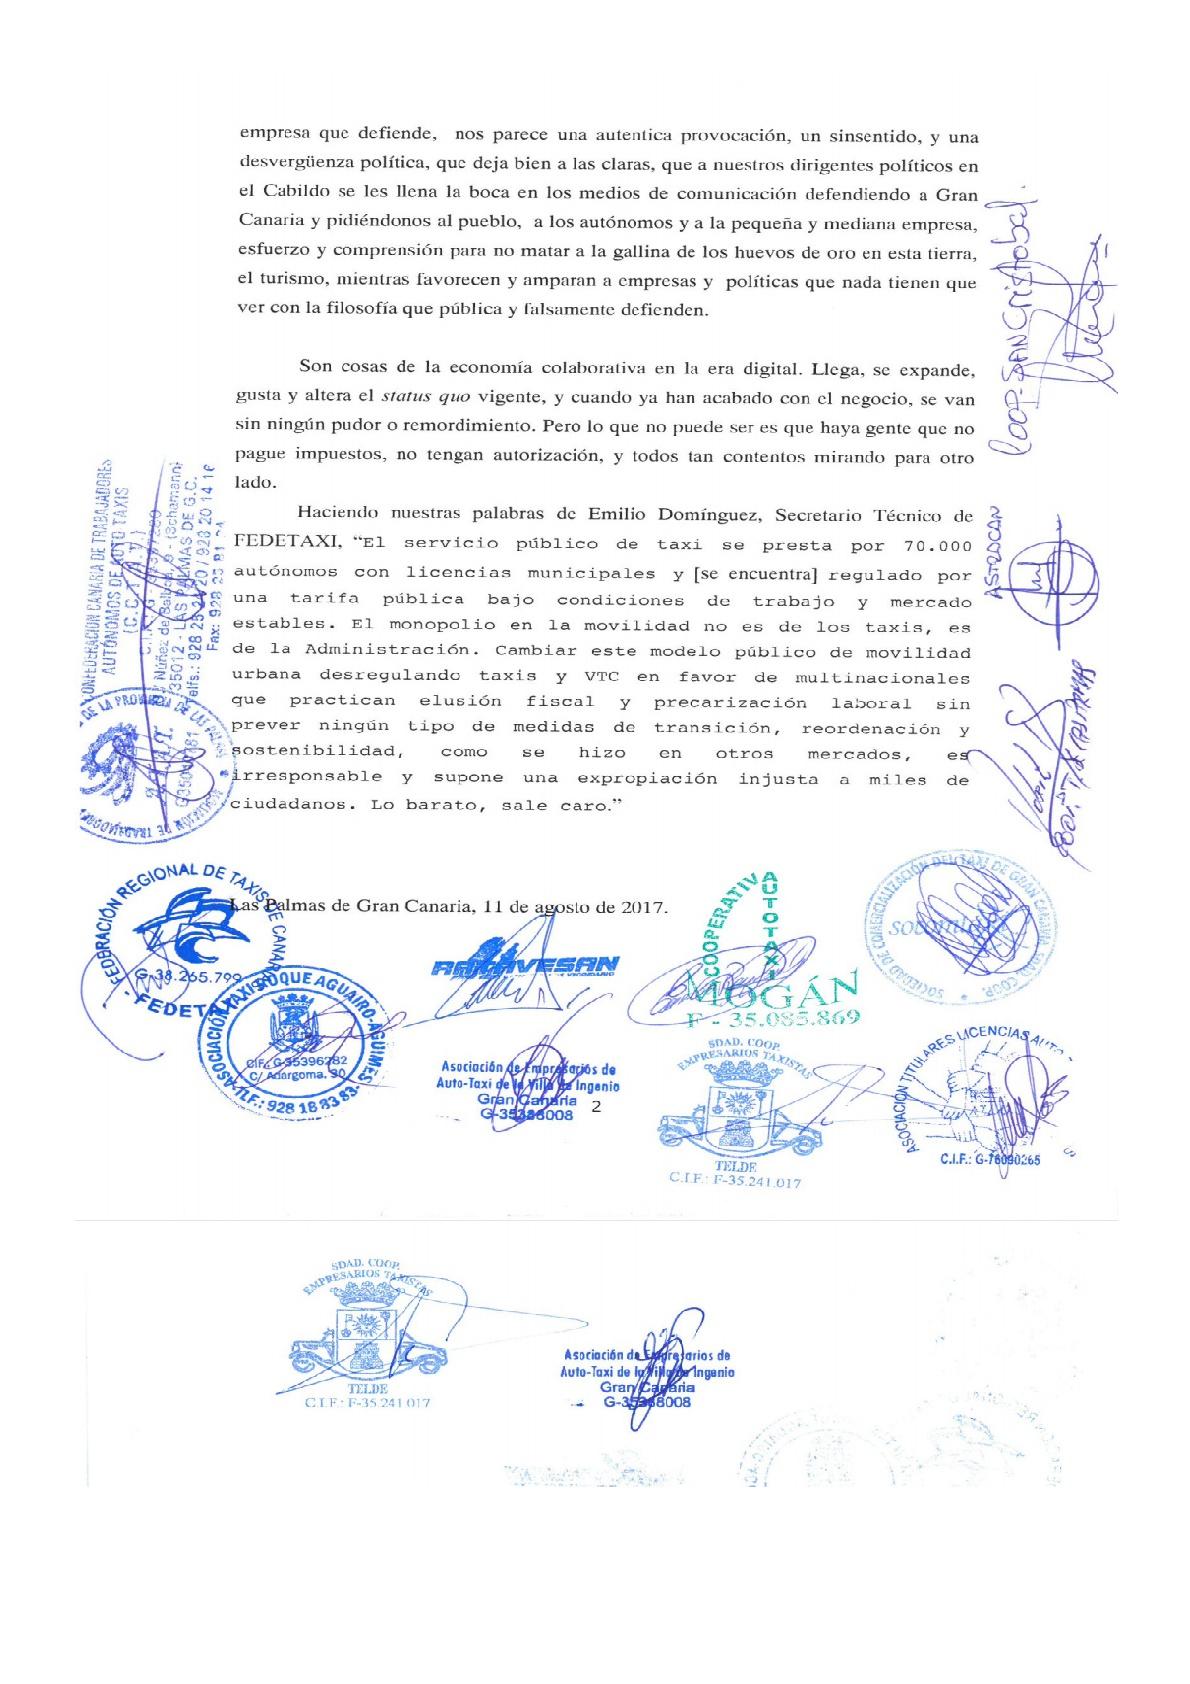 COMUNICADO-DE-PRENSA-002